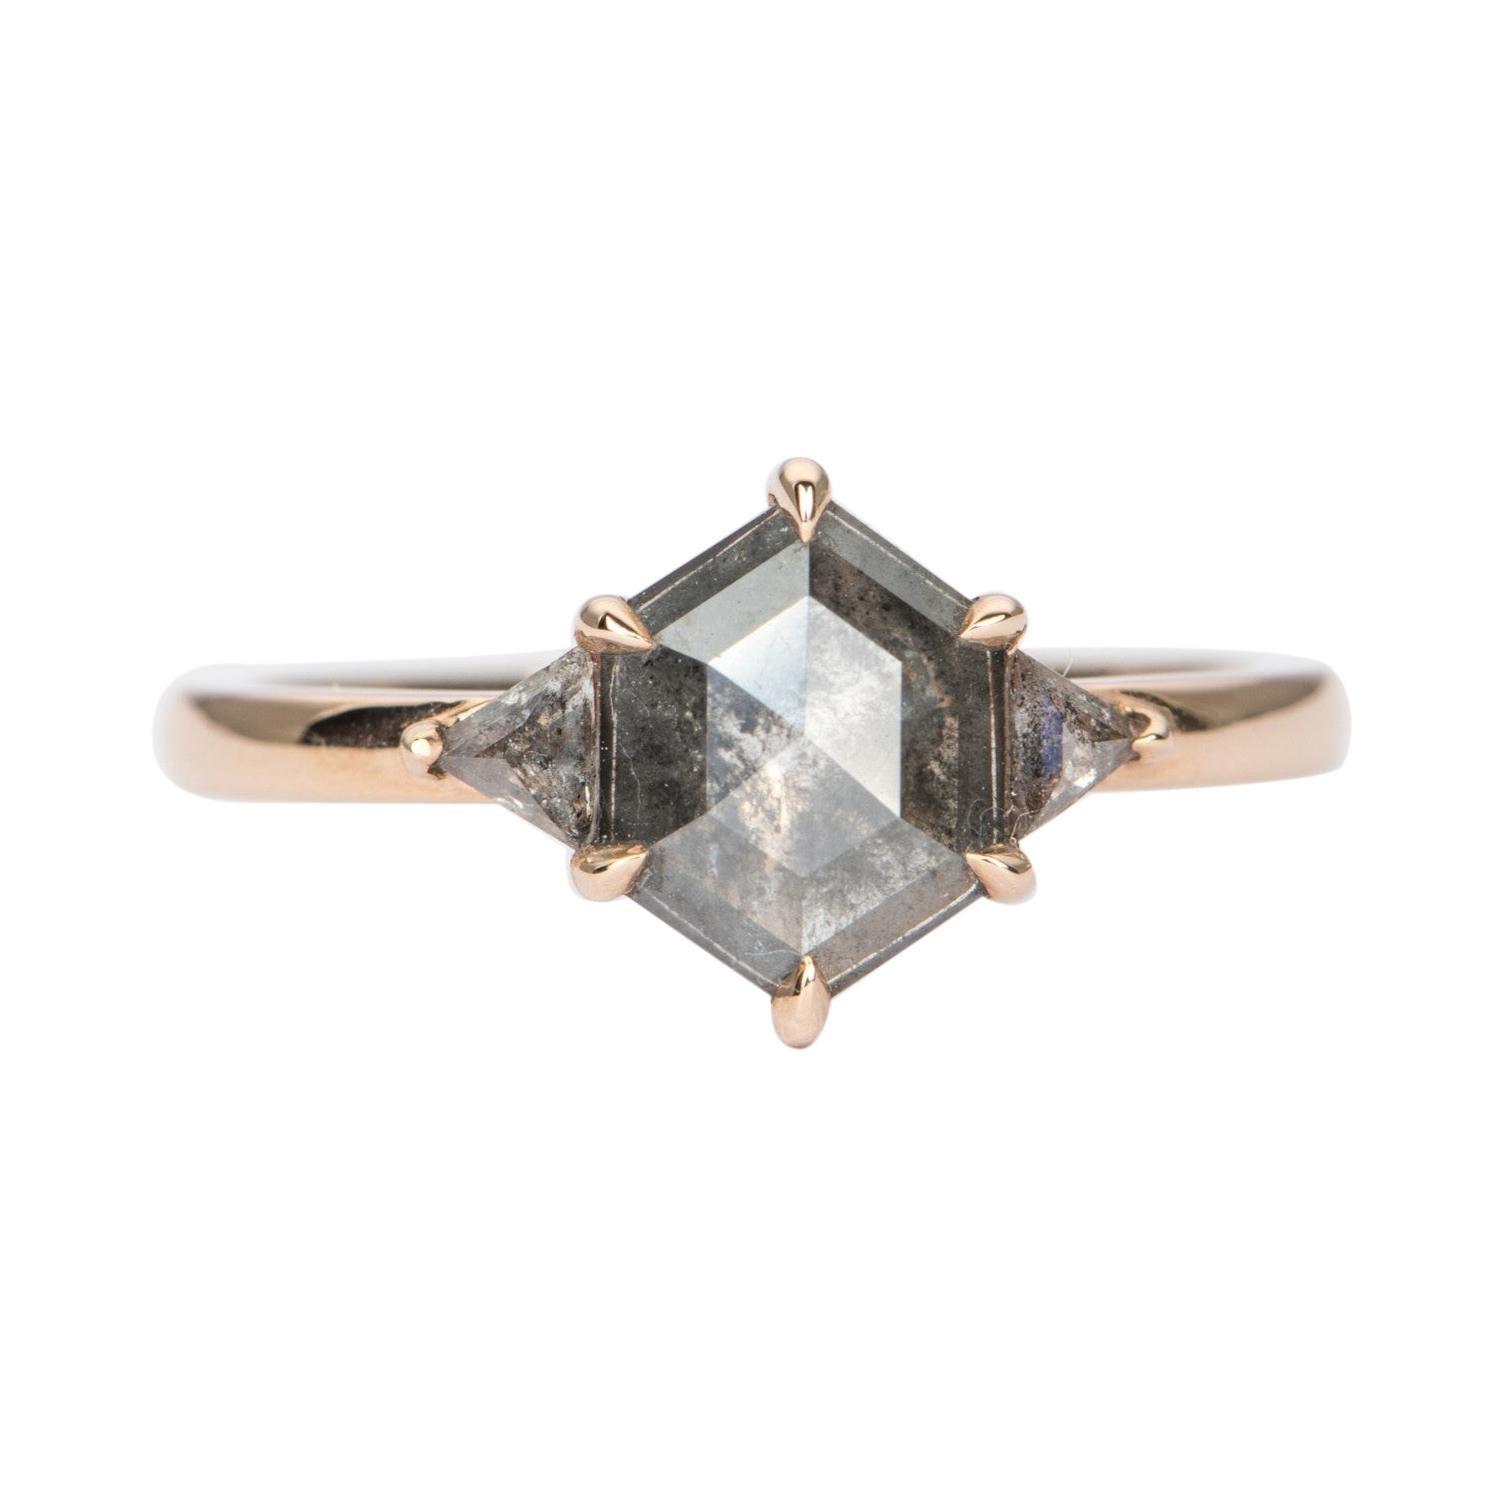 1.13ct Hexagon Salt and Pepper Diamond 14K Rose Gold Engagement Ring AD1749-31